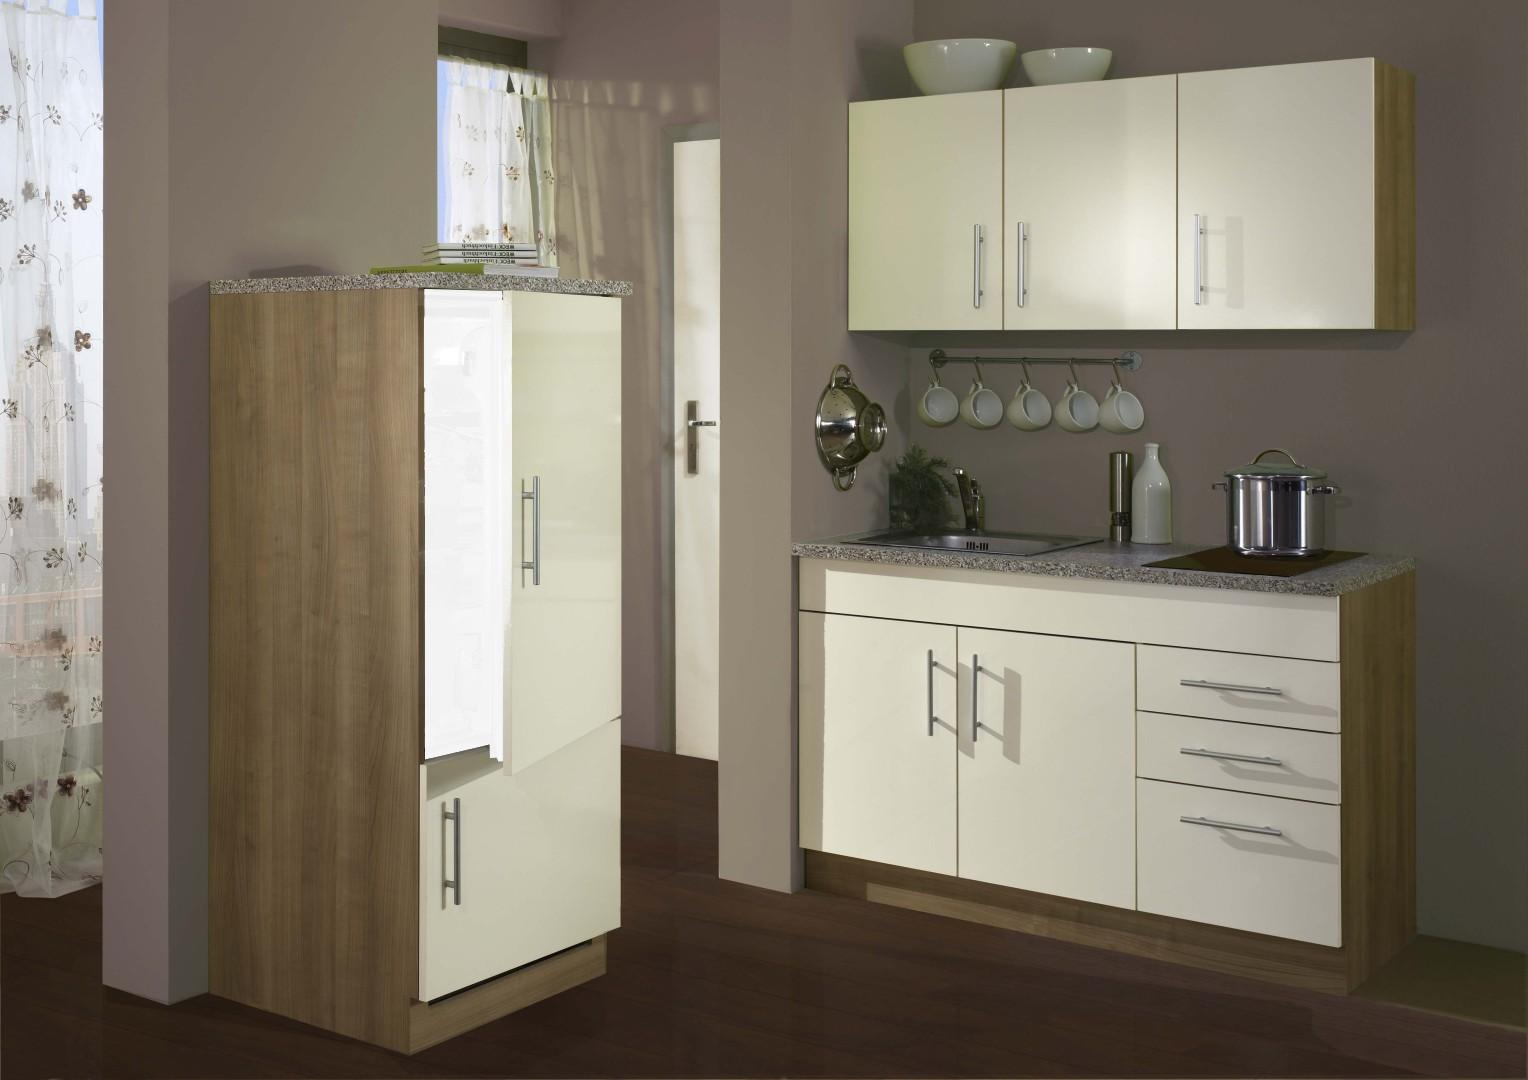 neu singlek che berlin mit glaskeramikkochfeld minik che 180cm b rok che creme porta westfalica. Black Bedroom Furniture Sets. Home Design Ideas